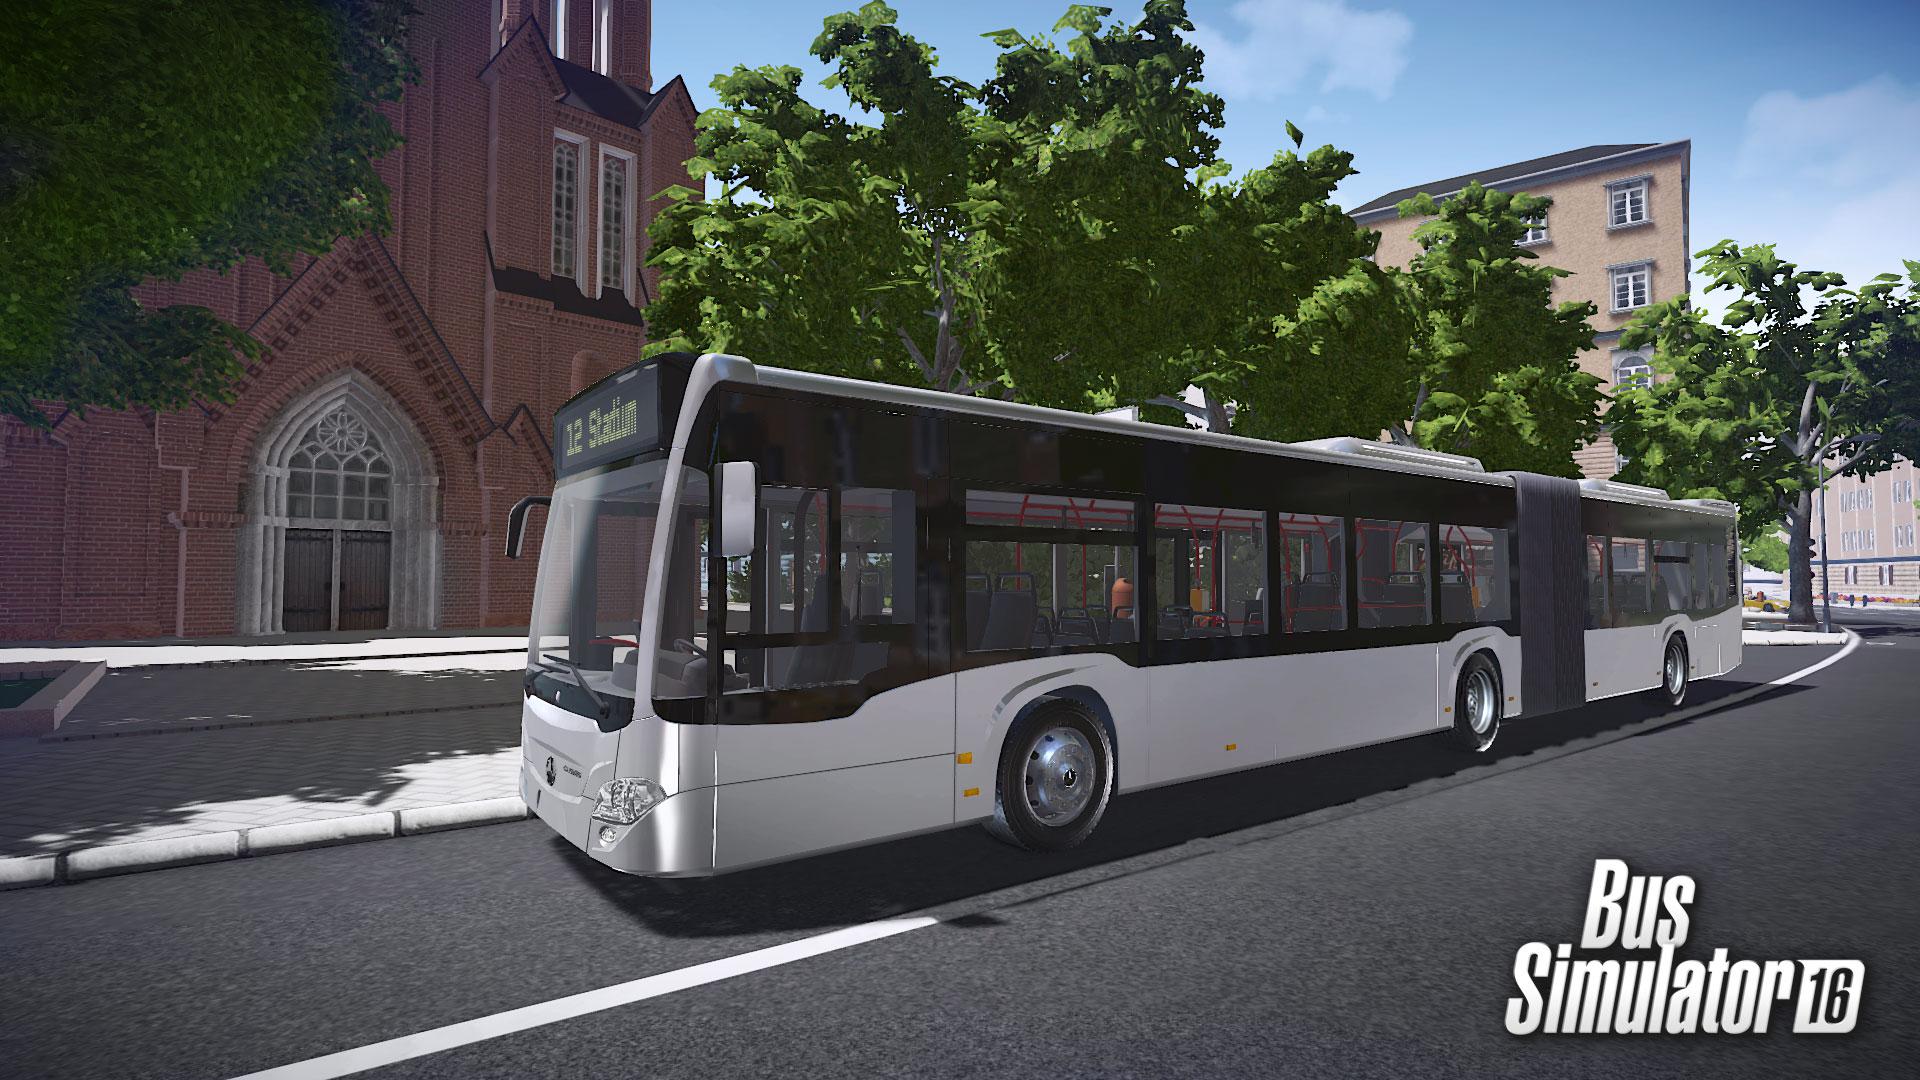 bus simulator 16 mercedes benz citaro buy and download on gamersgate. Black Bedroom Furniture Sets. Home Design Ideas